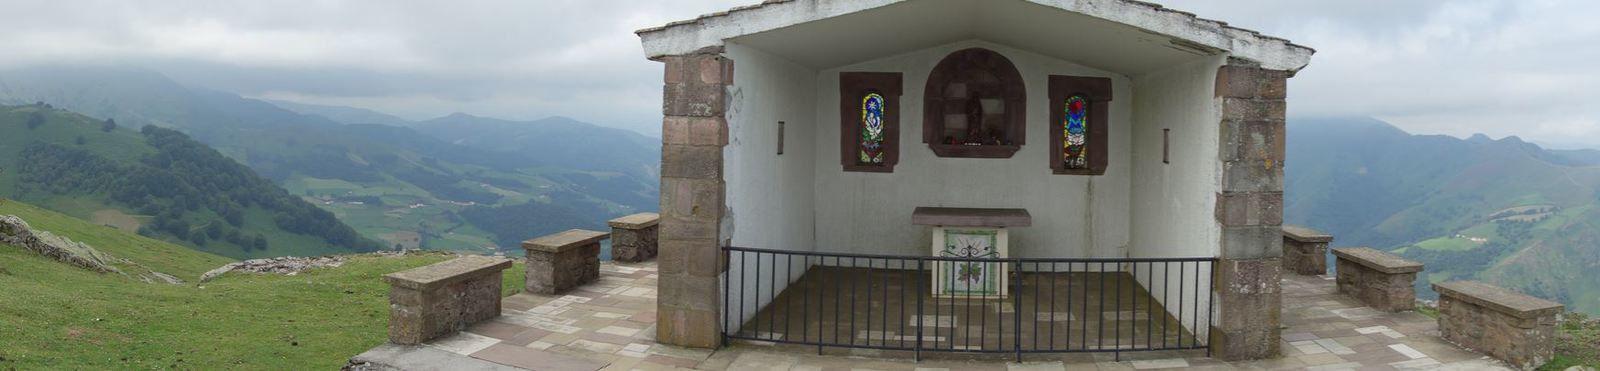 En 1941, le curé J.Olhagaroy décida de faire construire une chapelle qui sera inaugurée le 25 Mai 1942.